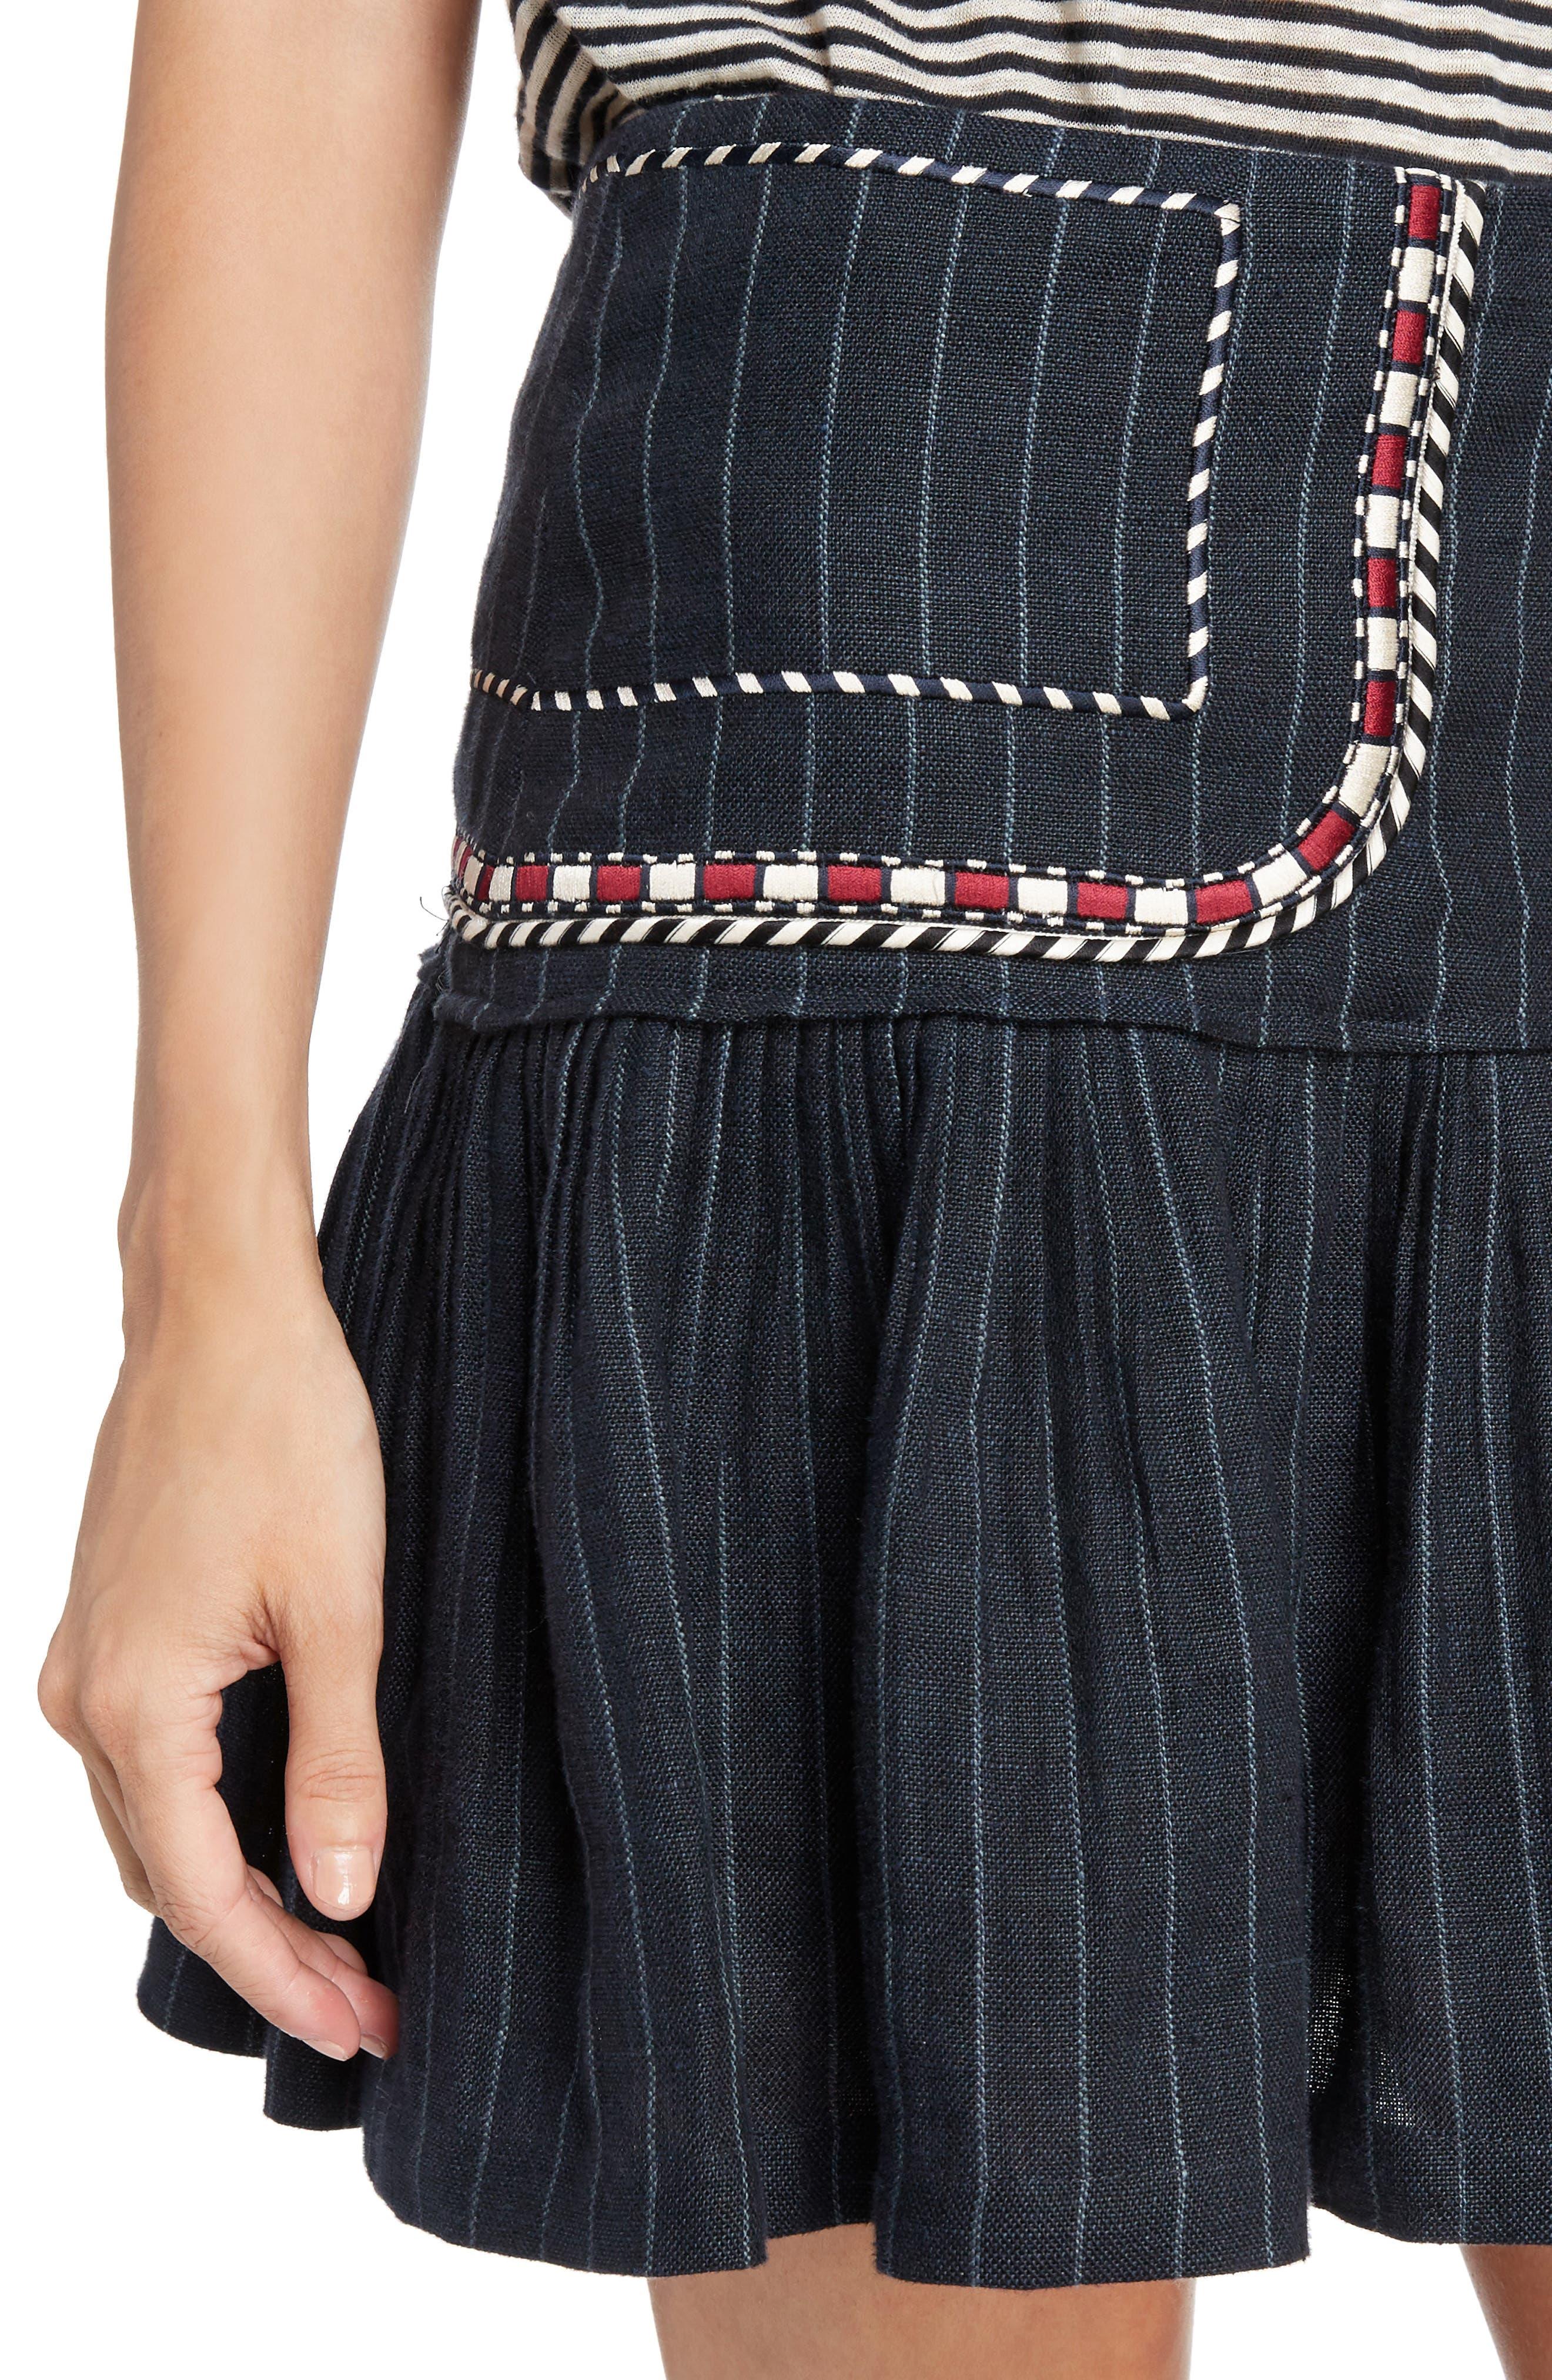 Isabel Marant Étoile Jessie Embroidered Linen Skirt,                             Alternate thumbnail 4, color,                             001